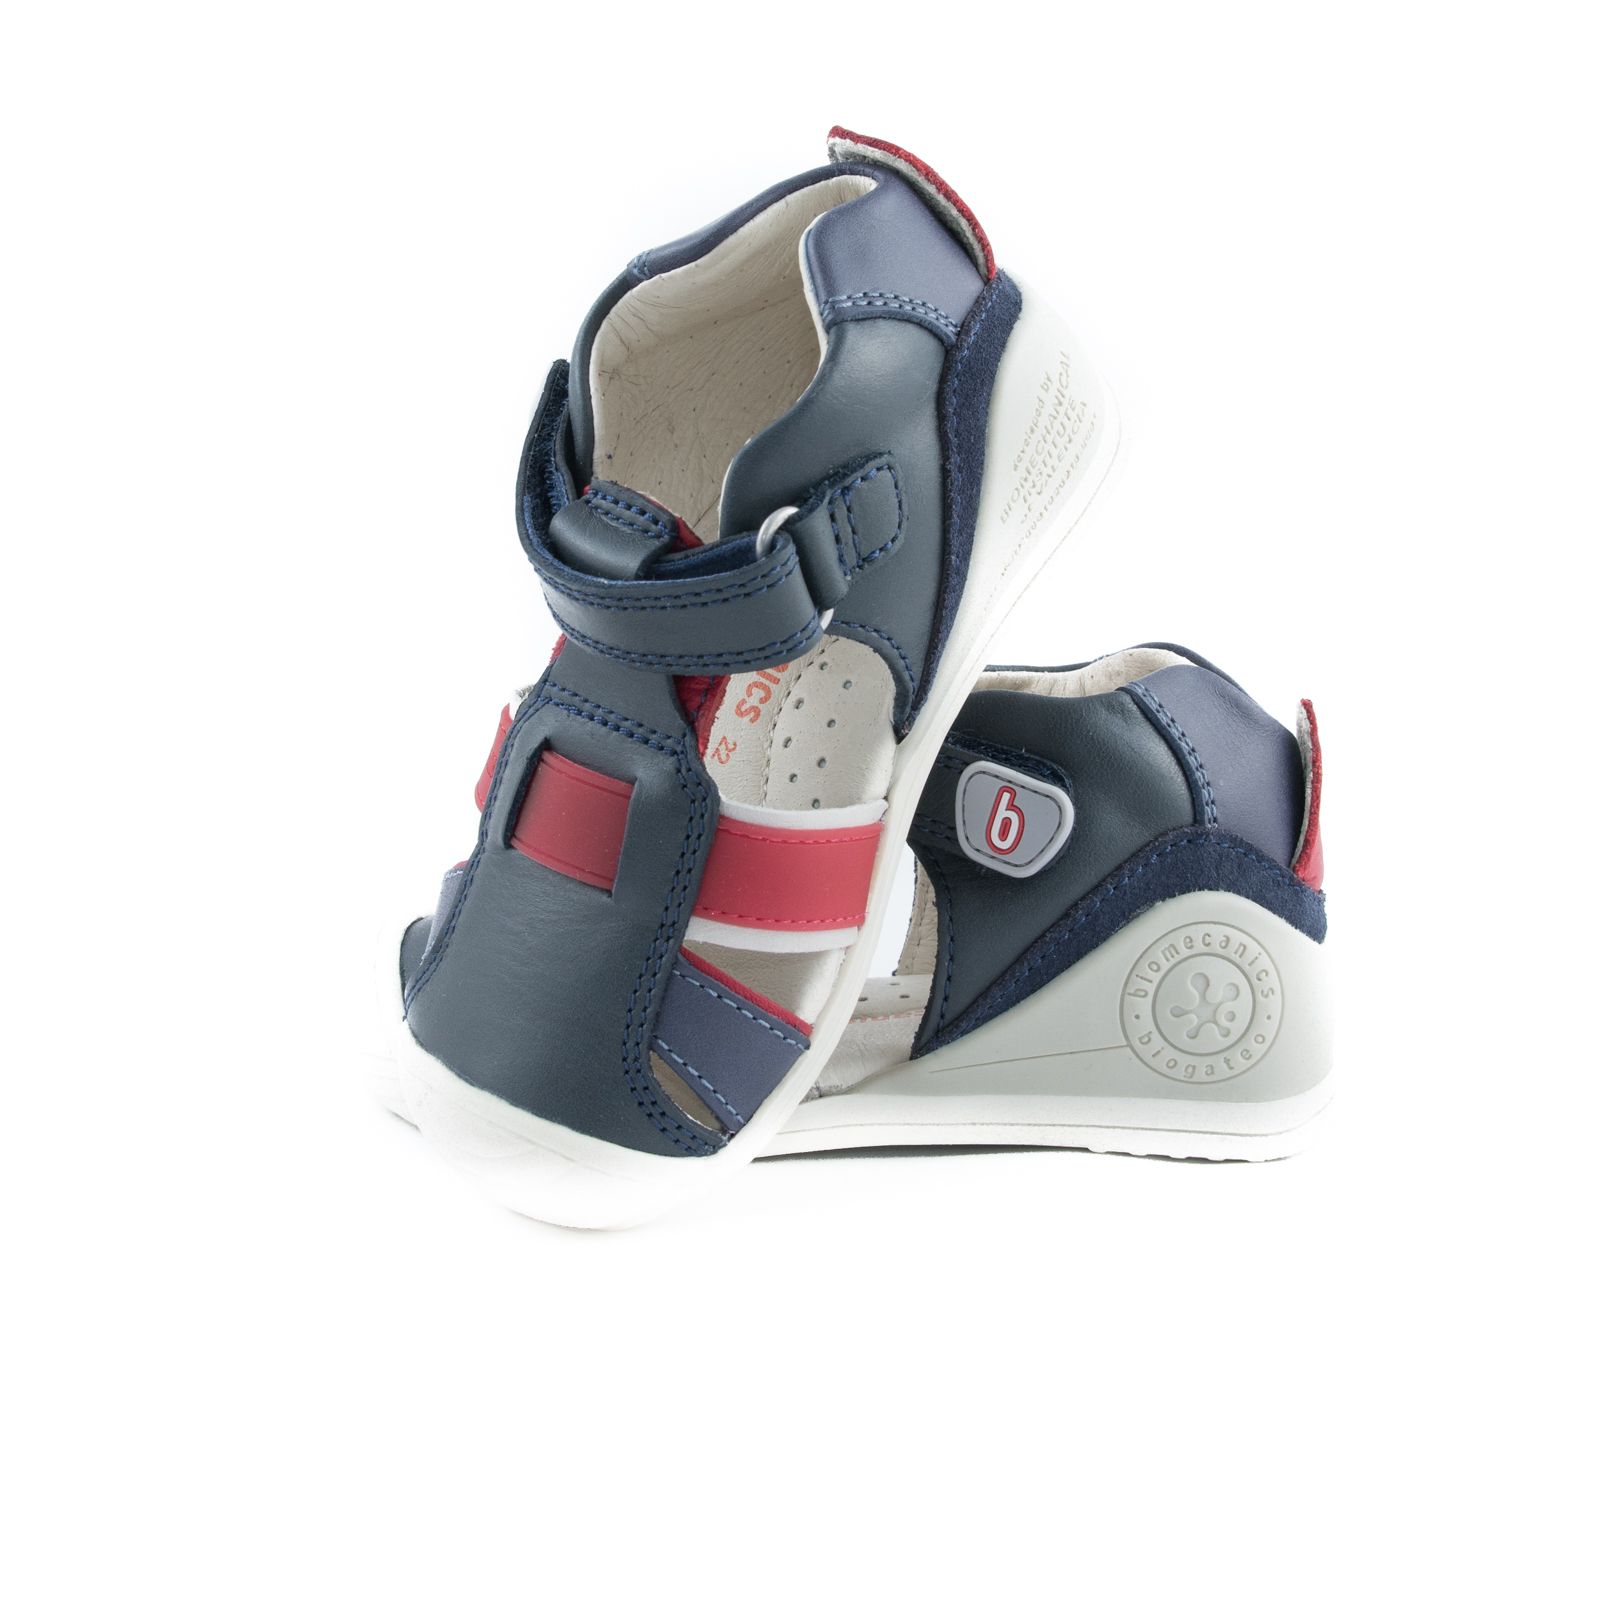 BIOMECANICS Sandals  192135